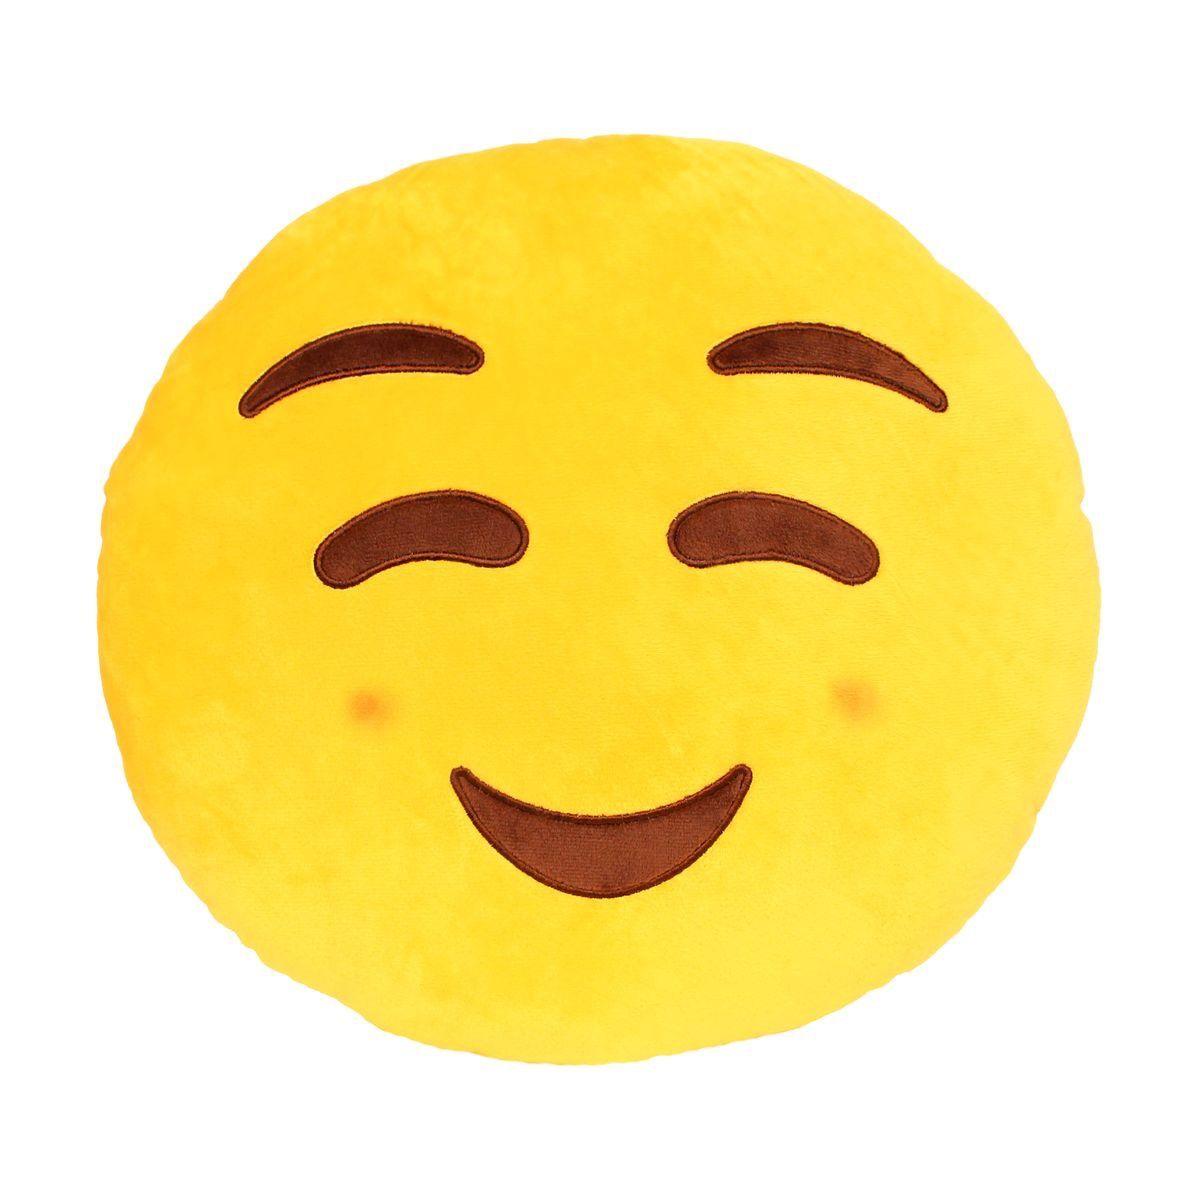 Pin By Valerie Clark On Emoji Lovers